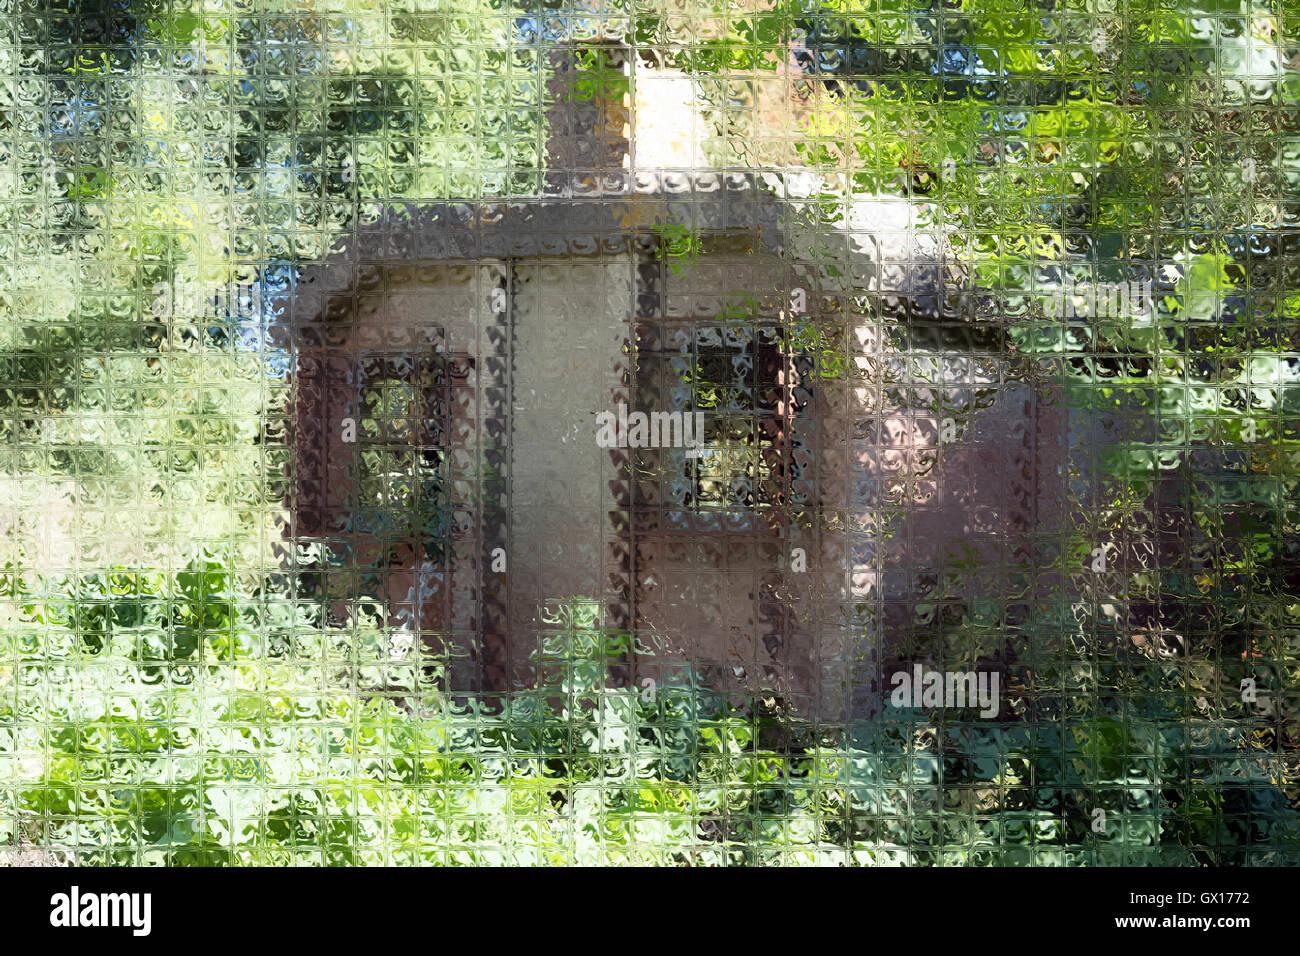 Digitally enhanced photograph - Stock Image